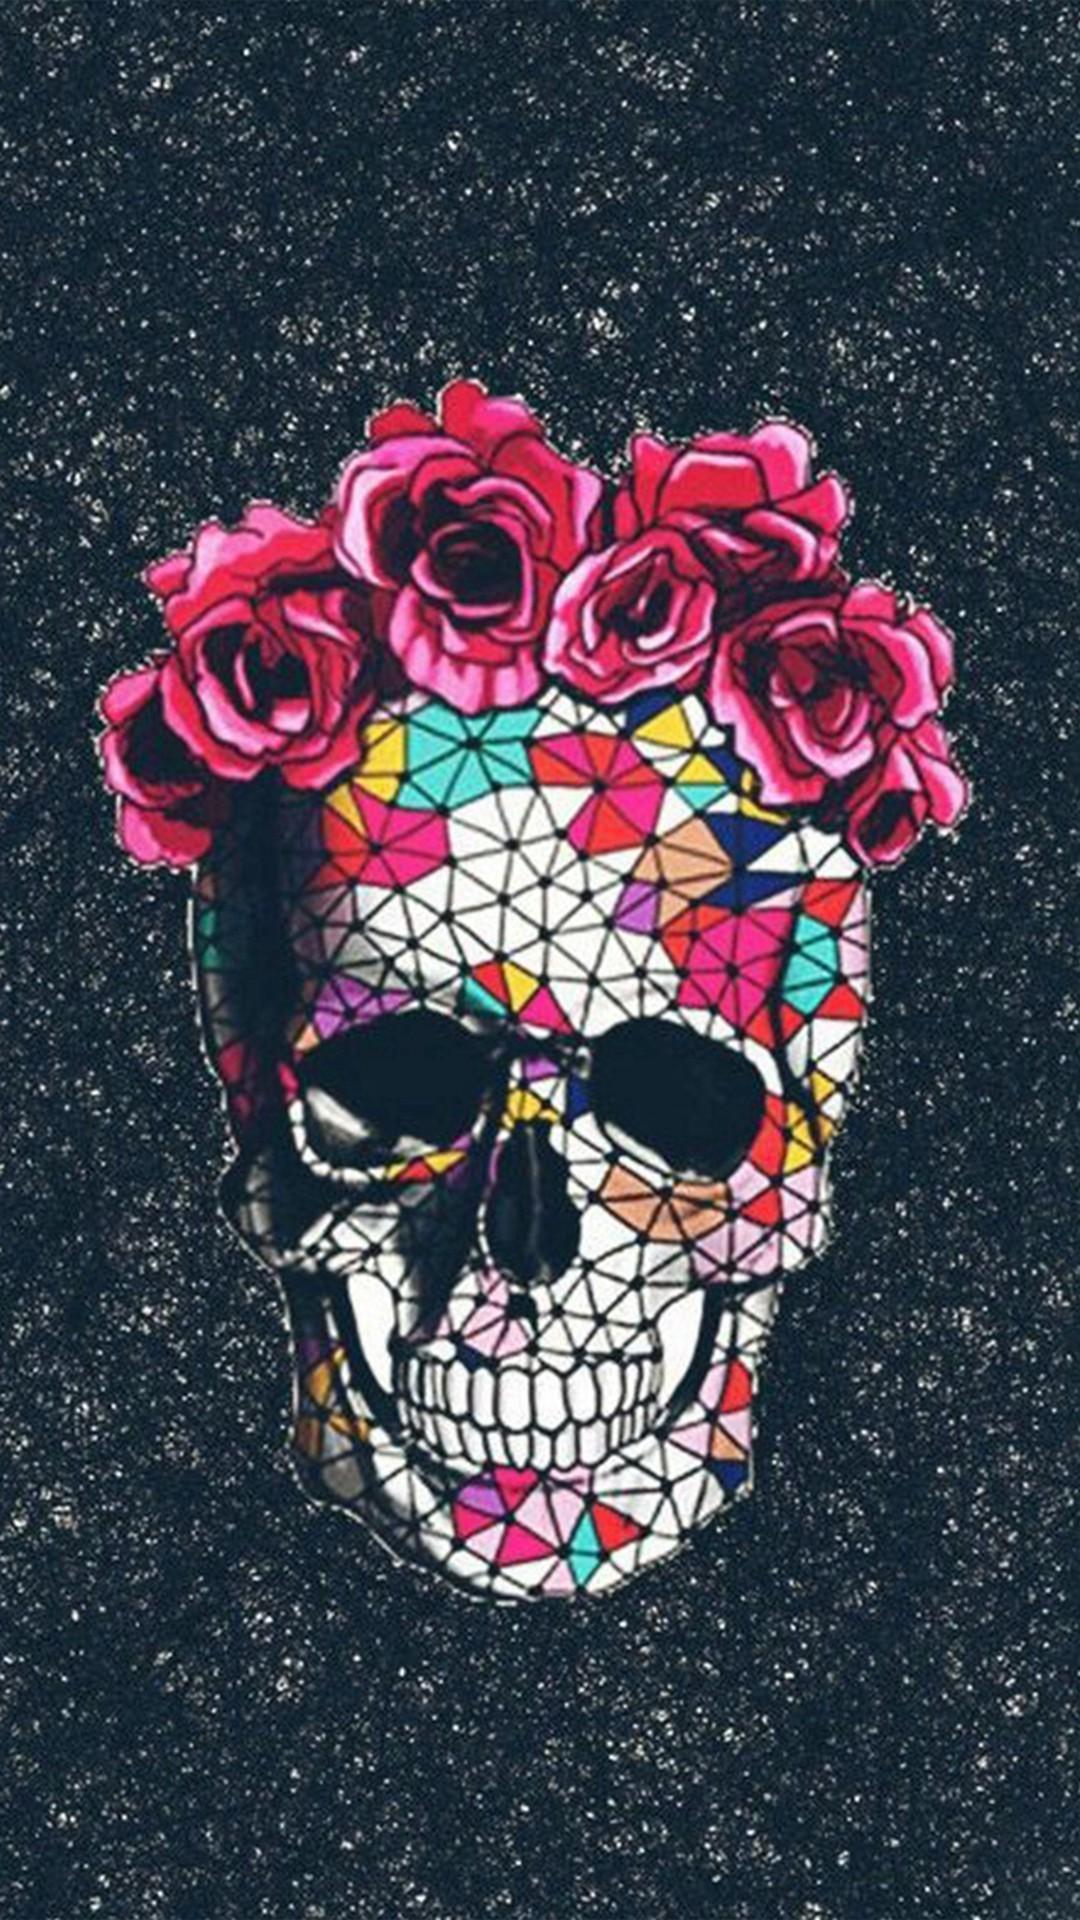 Sugar Skull Iphone X Wallpapers Wallpaper Cave